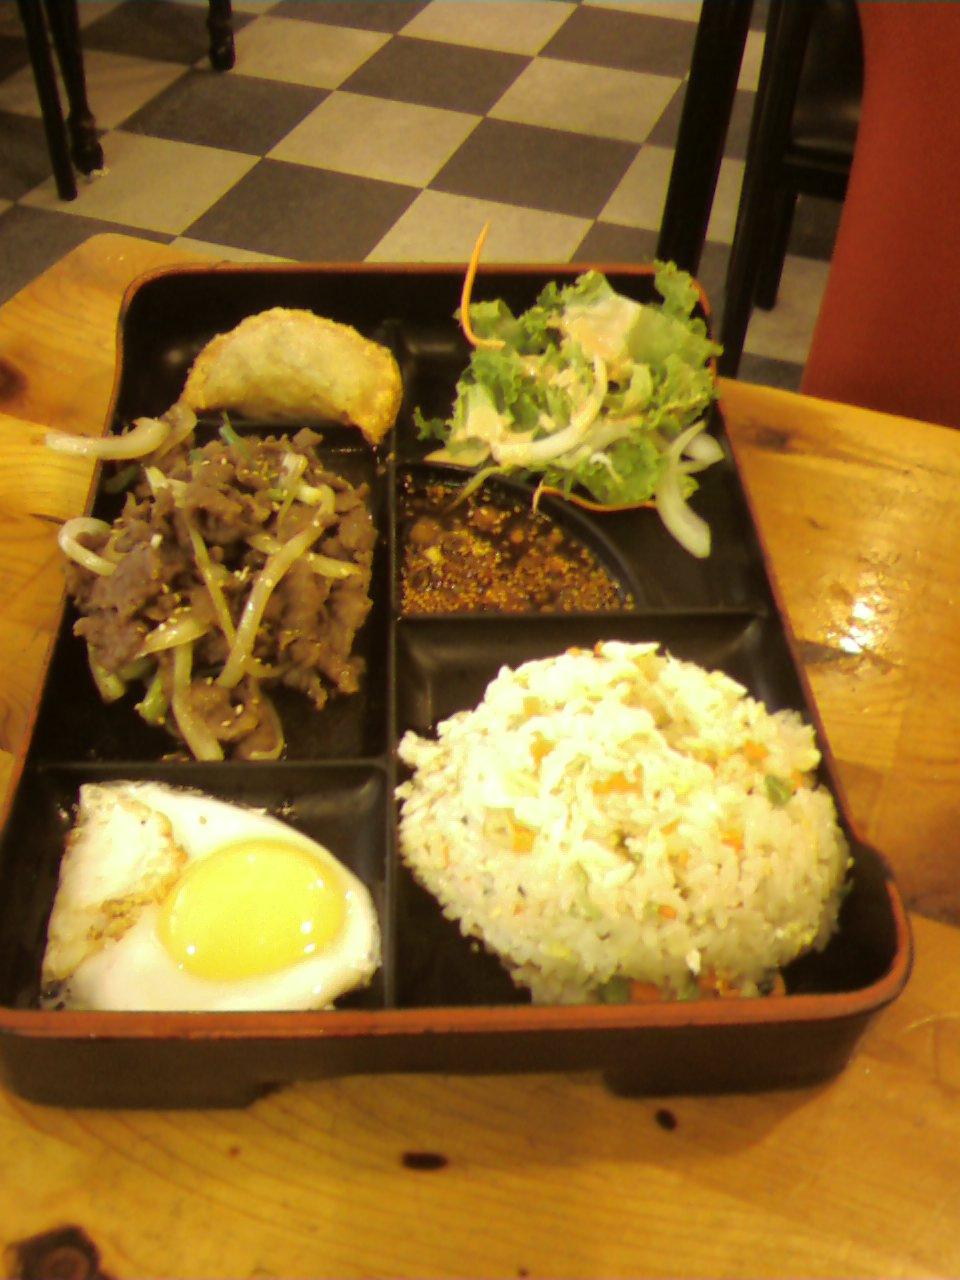 Mealtime! Jong Kak